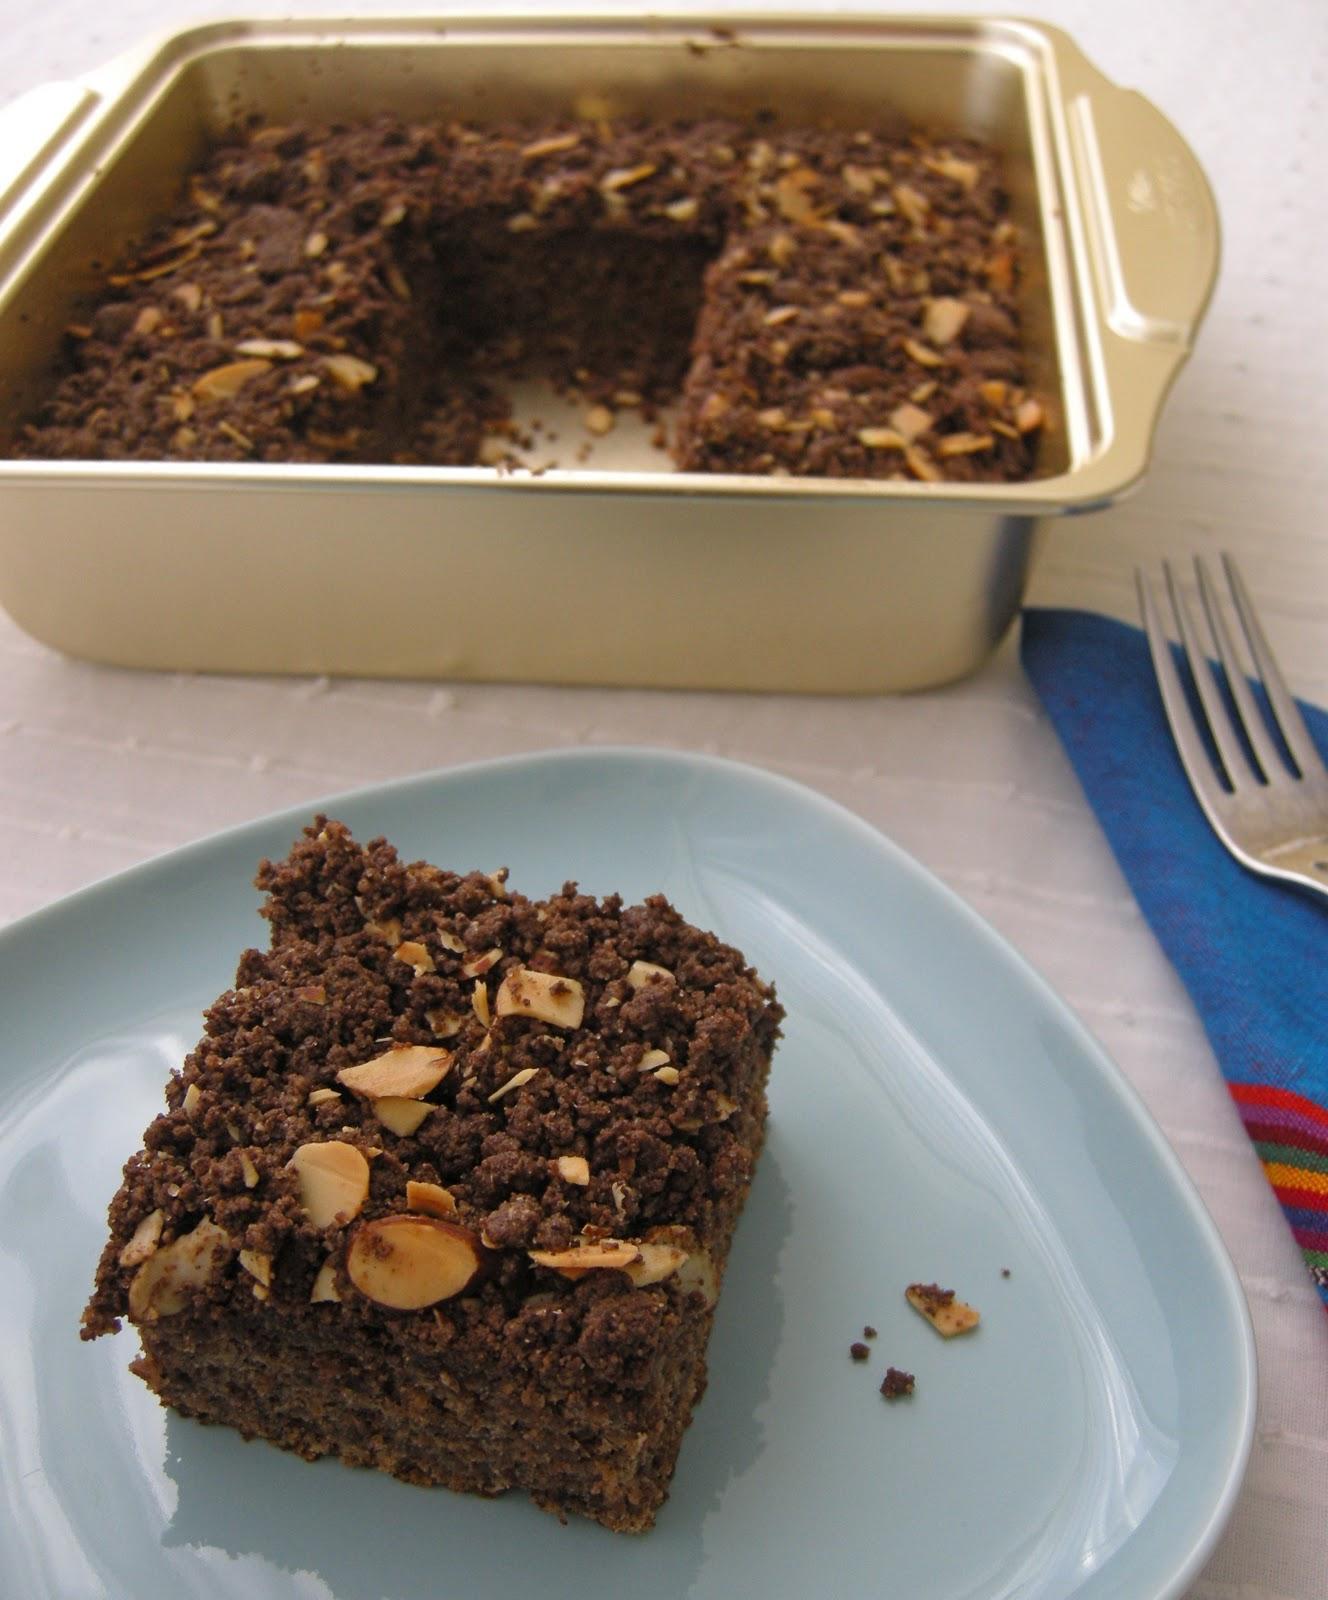 Ibarra Chocolate Cake